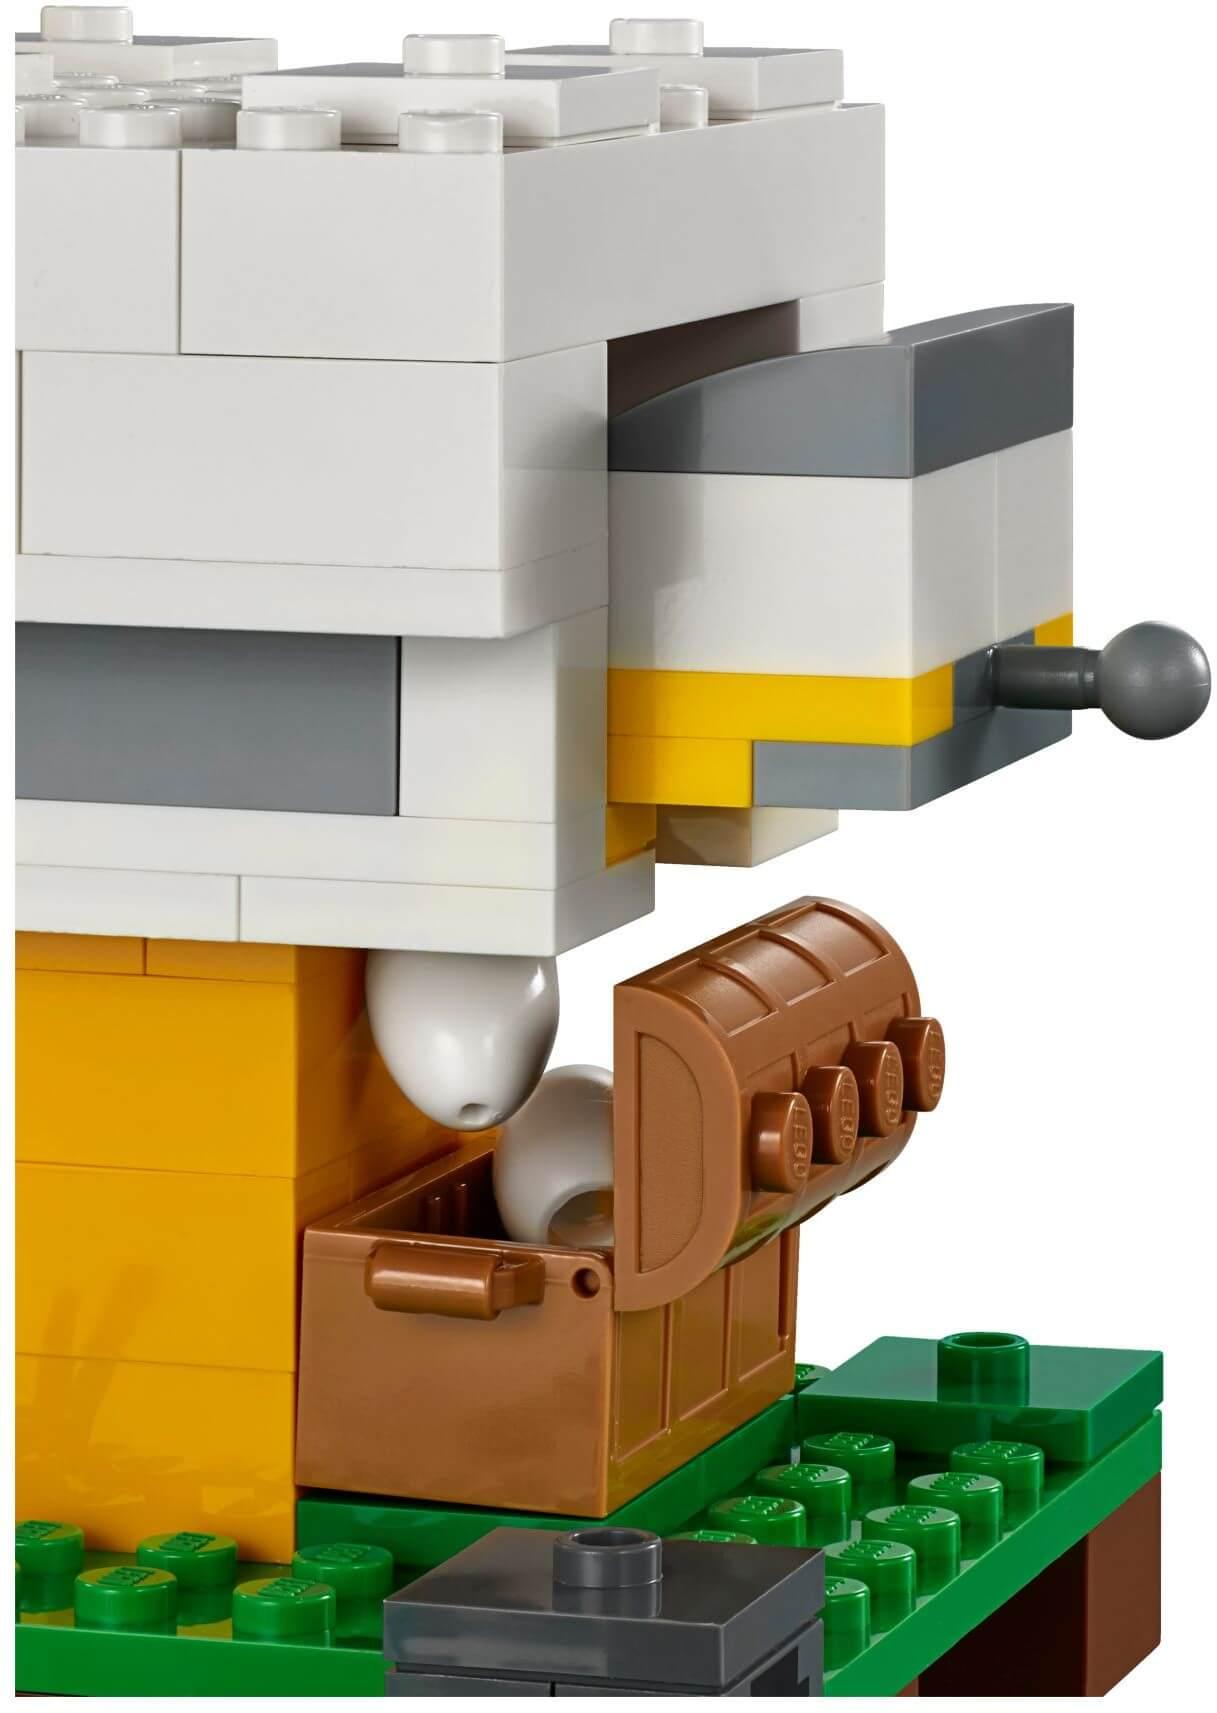 Mua đồ chơi LEGO 21140 - LEGO Minecraft 21140 - Nông Trại nuôi Gà của Alex (LEGO Minecraft 21140 The Chicken Coop)